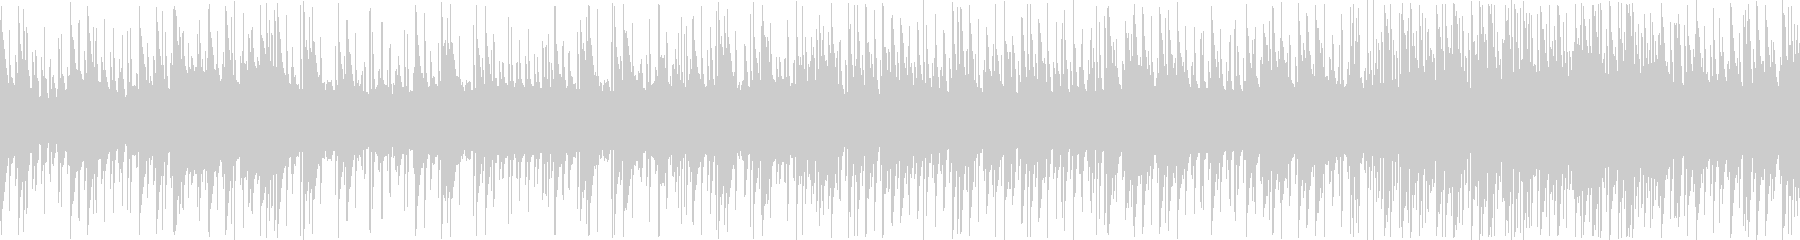 8bit スペースチックBGM ループ版の未再生の波形